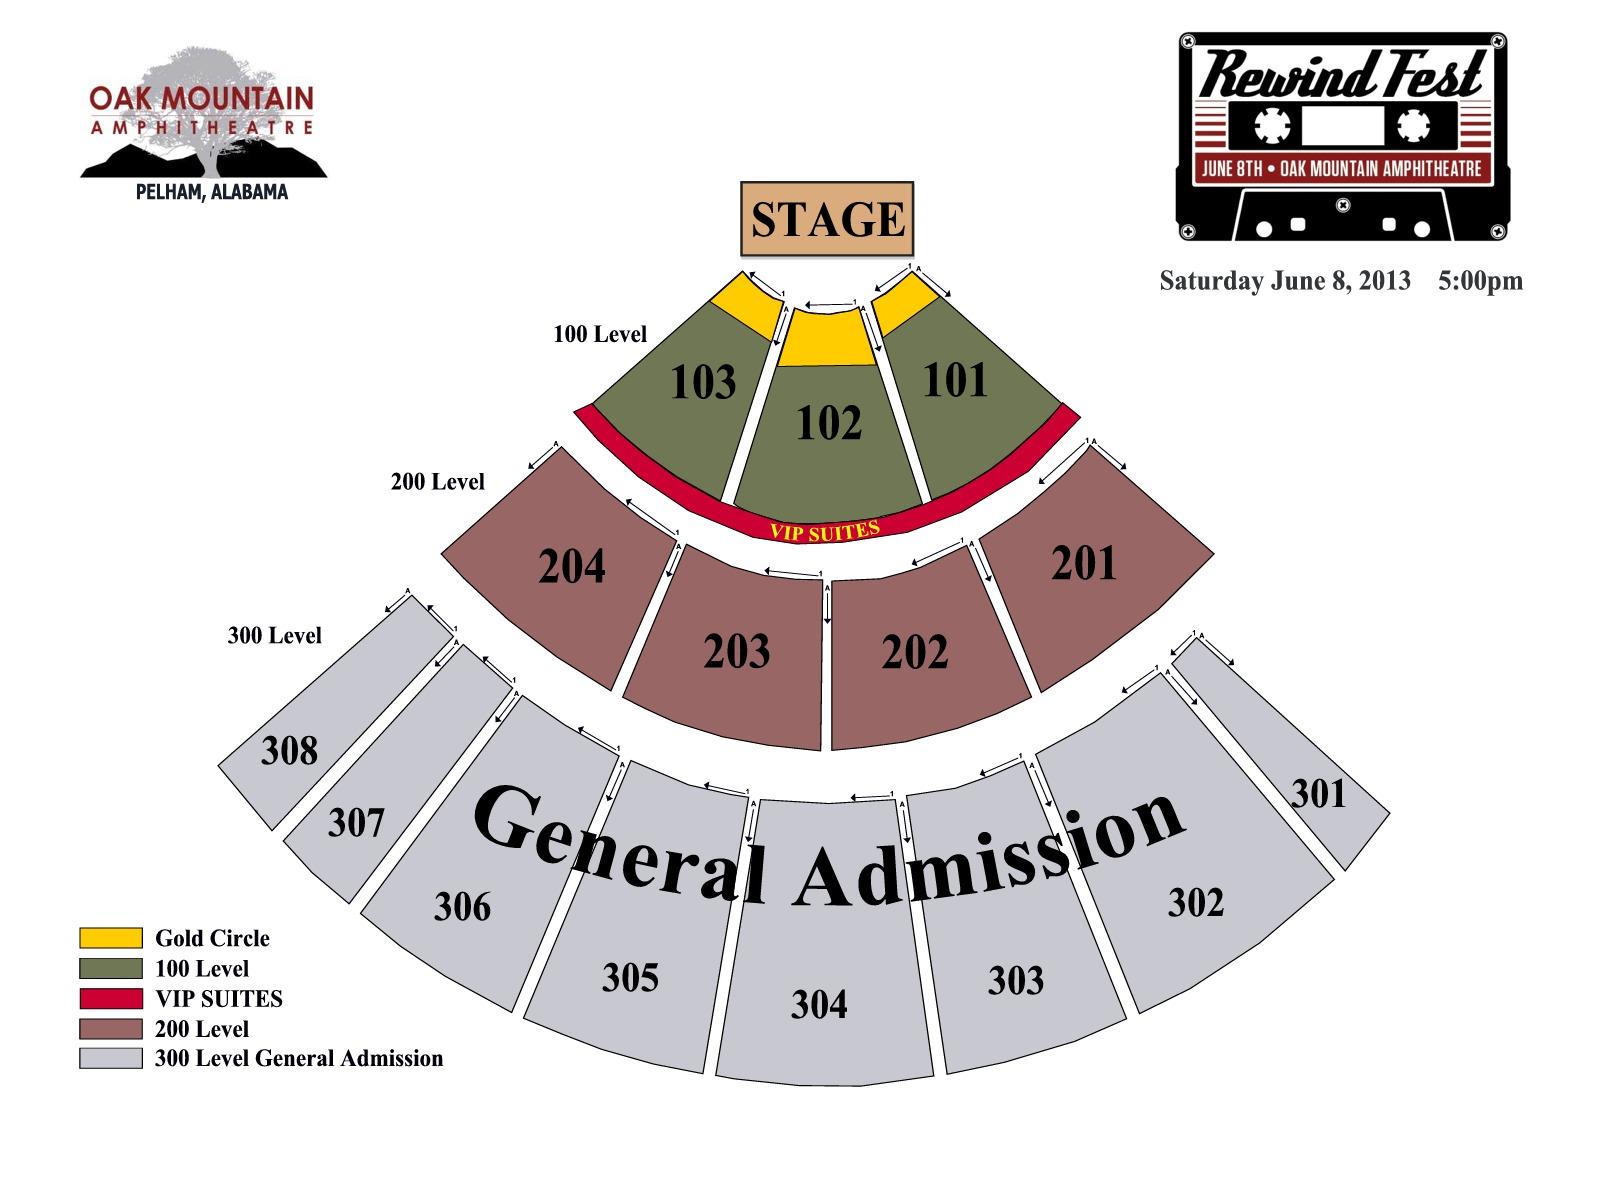 Oak Mountain Amphitheatre - Birmingham | Tickets, Schedule, Seating ...